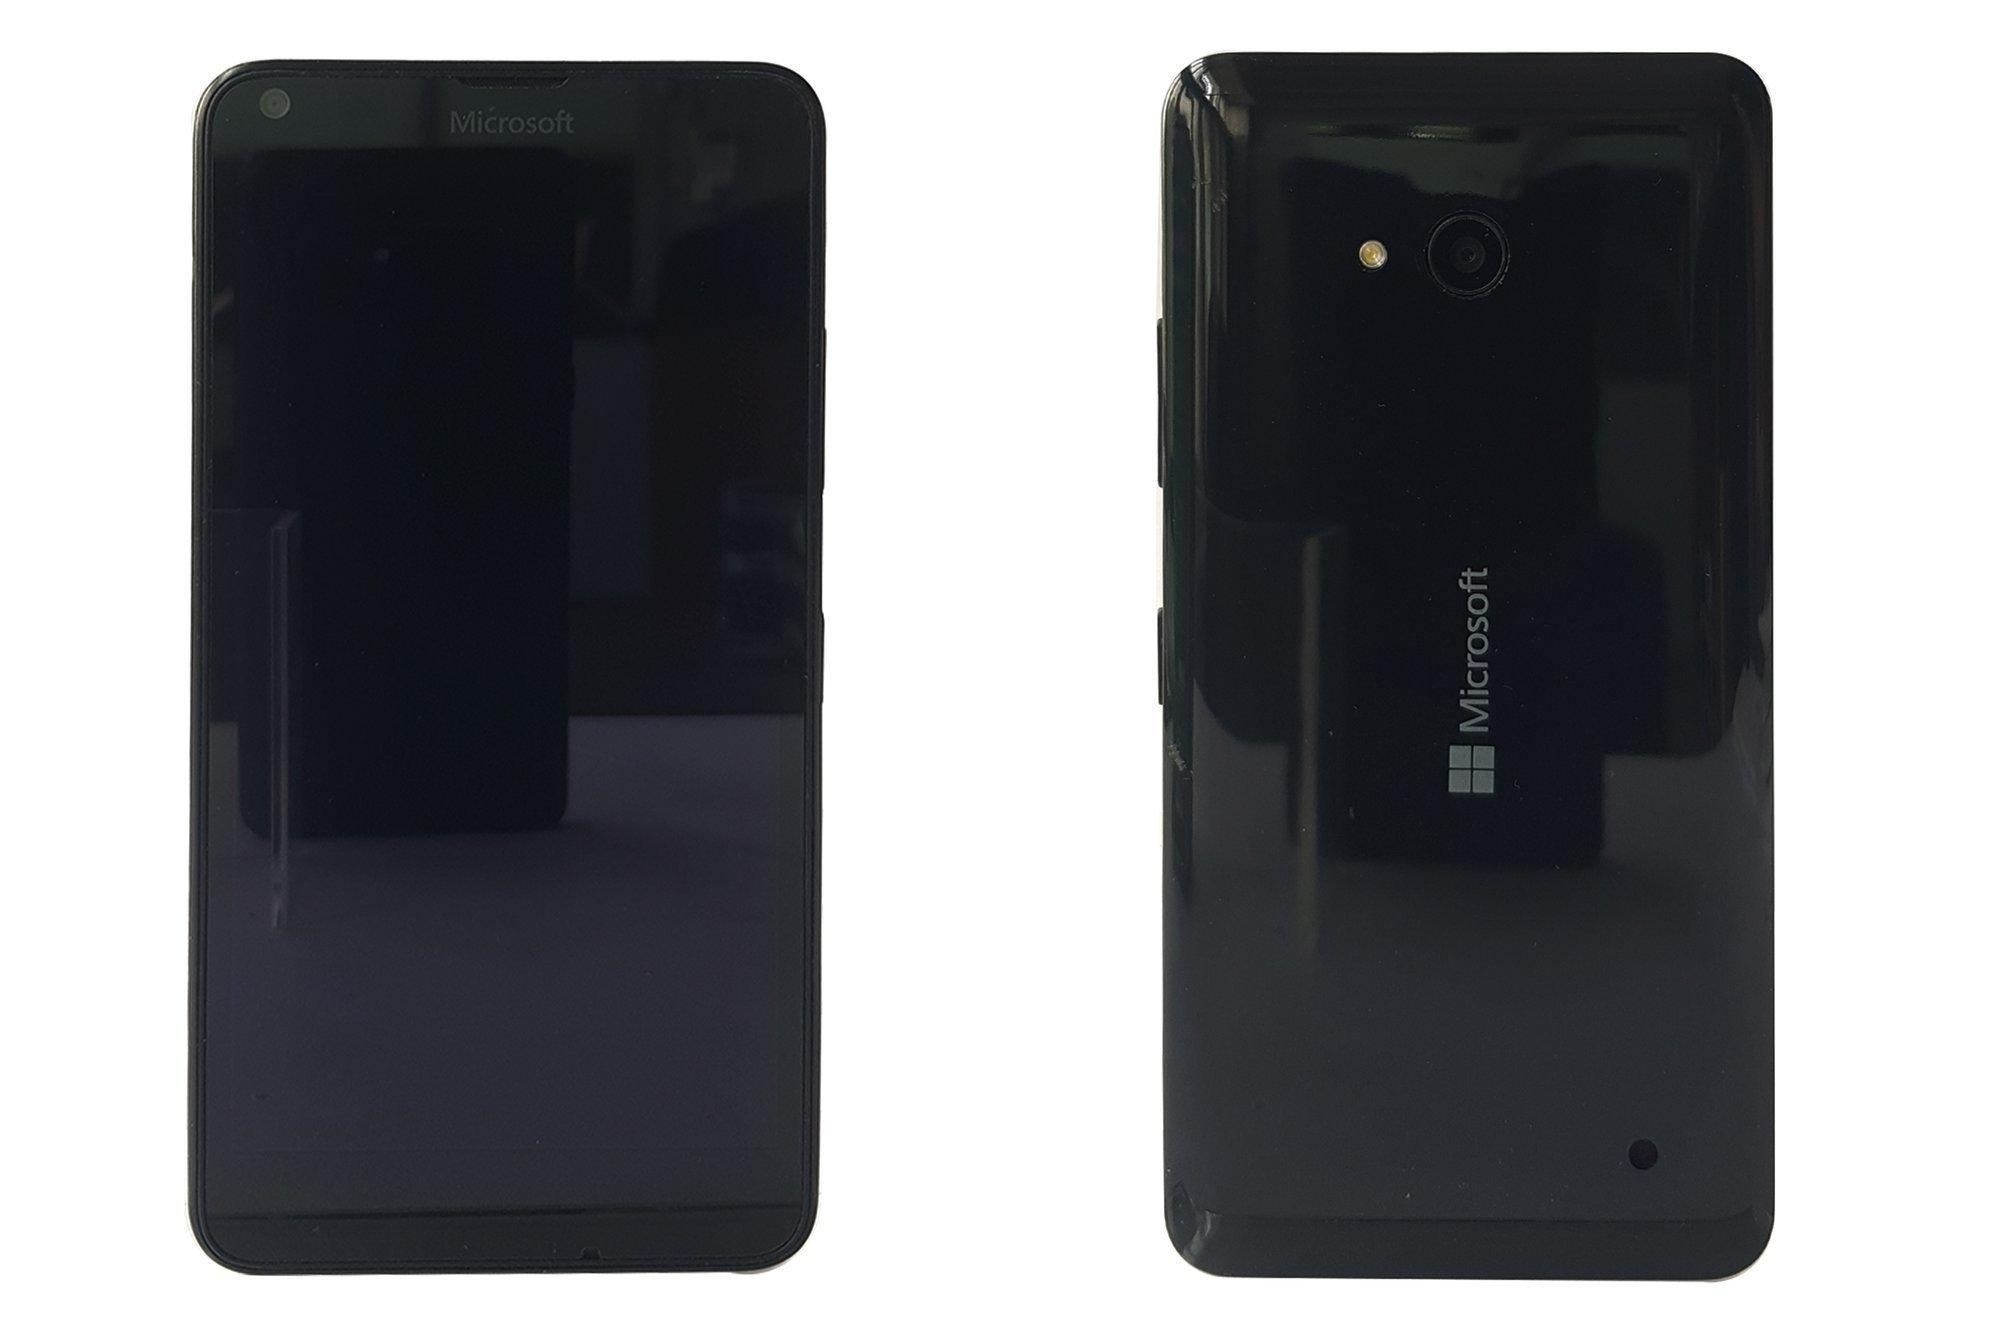 Smartphone Microsoft Lumia 640 RM-1072 Black Damaged